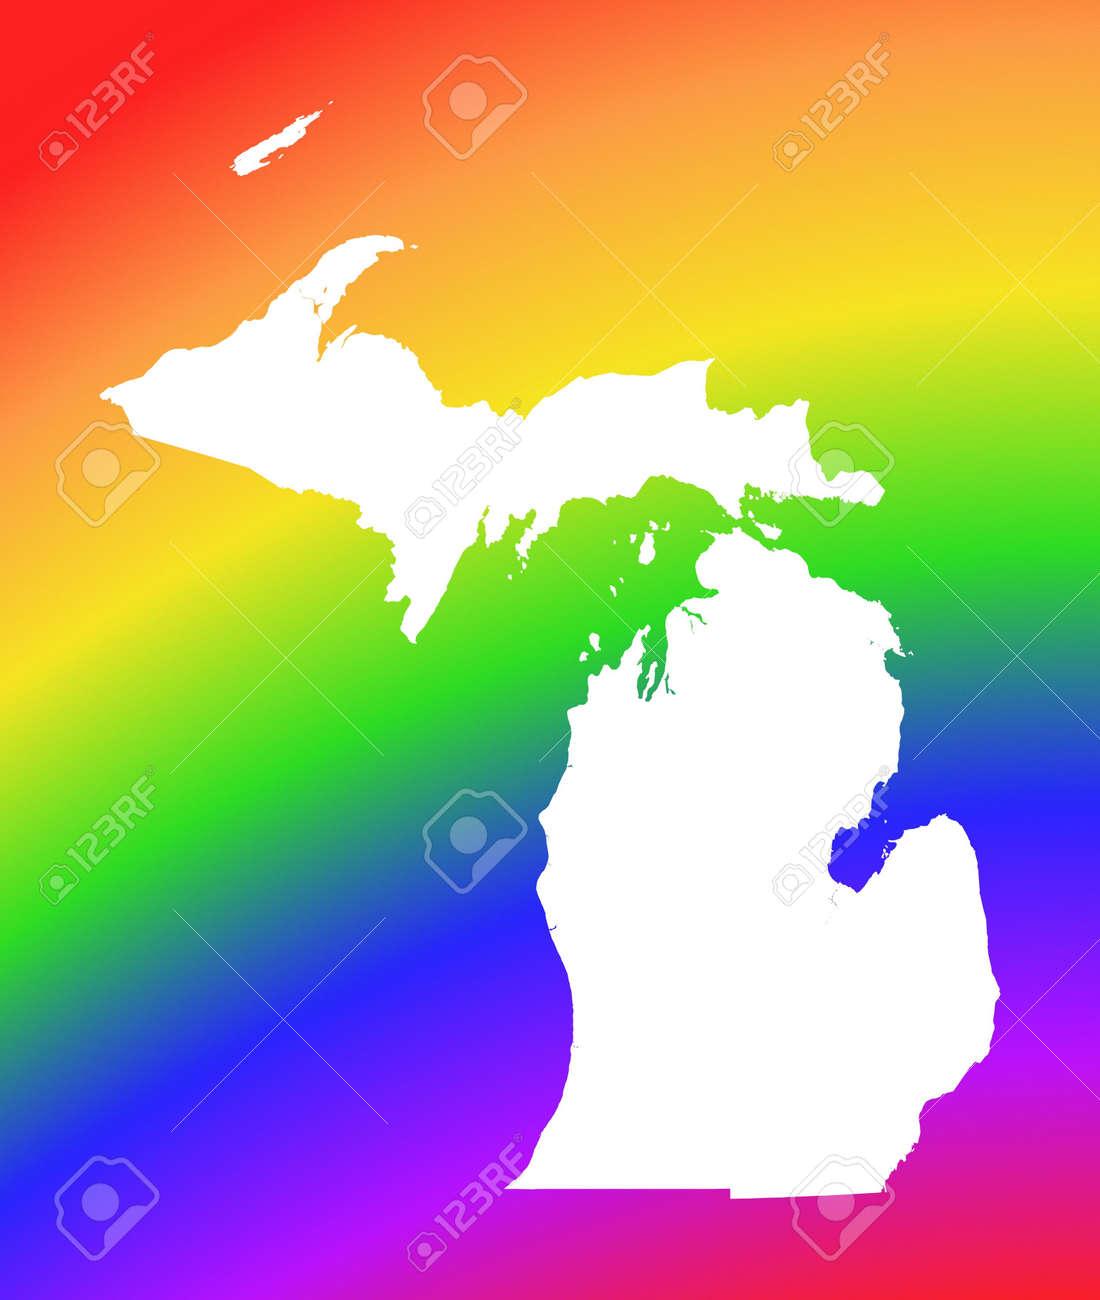 FileBlank US Map States Onlysvg Wikimedia Commons Chicago Maps - Usa map high resolution